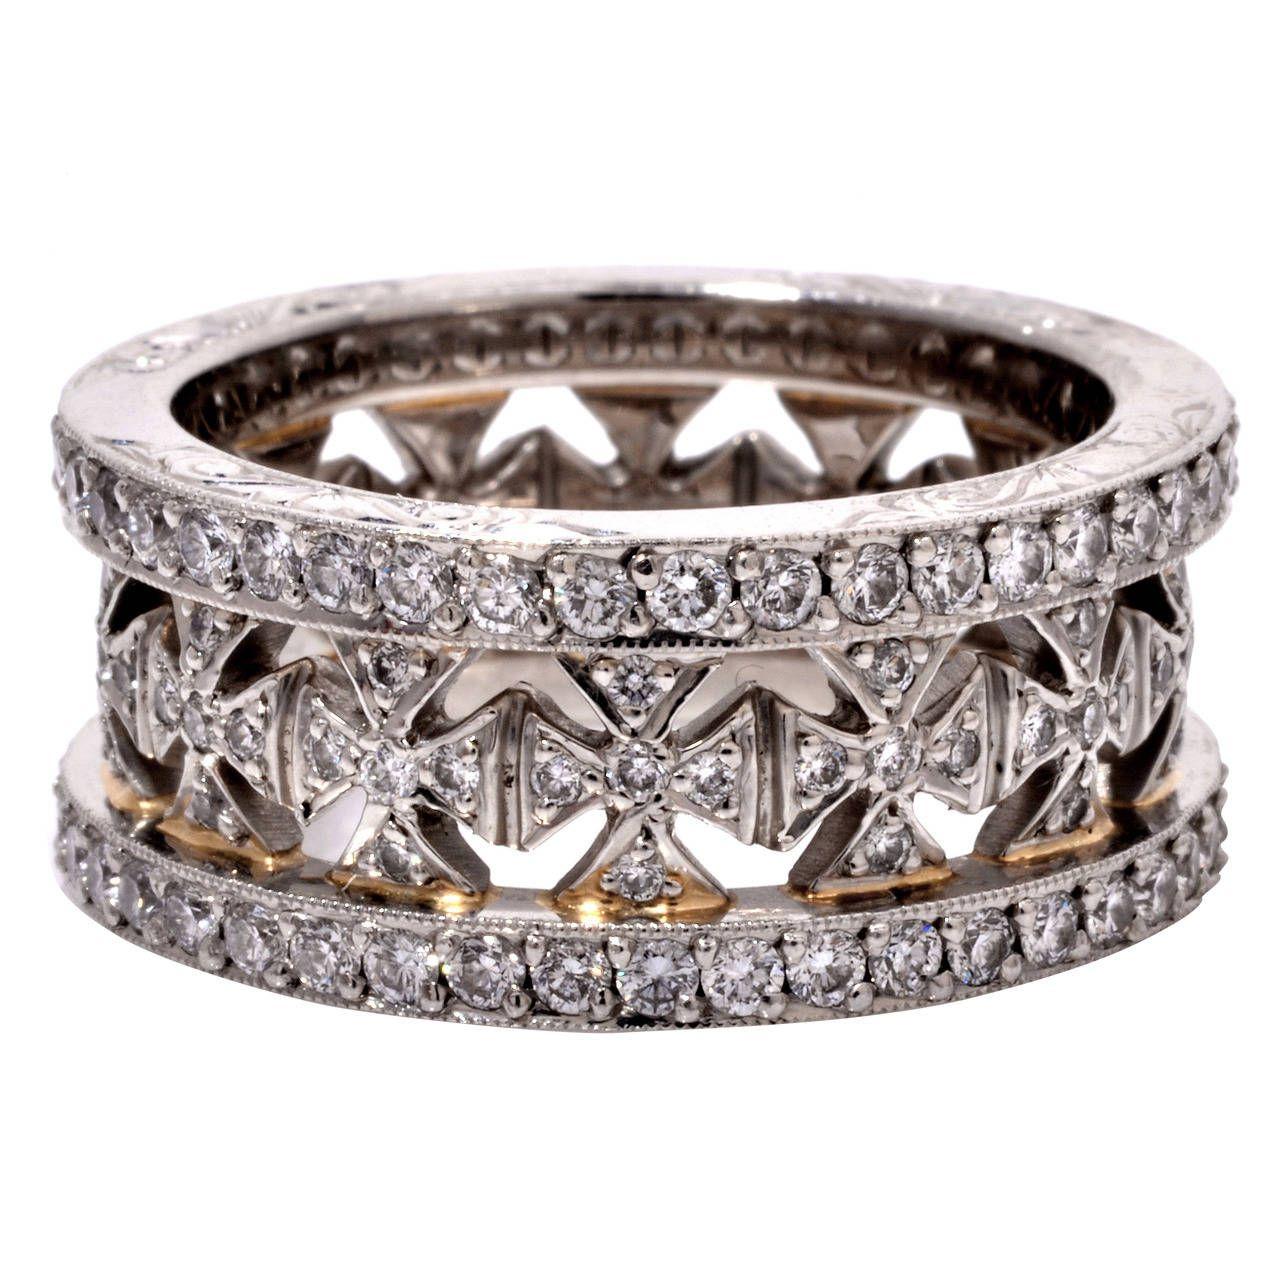 Beaudry diamond platinum wide eternity band ring 1stdibs